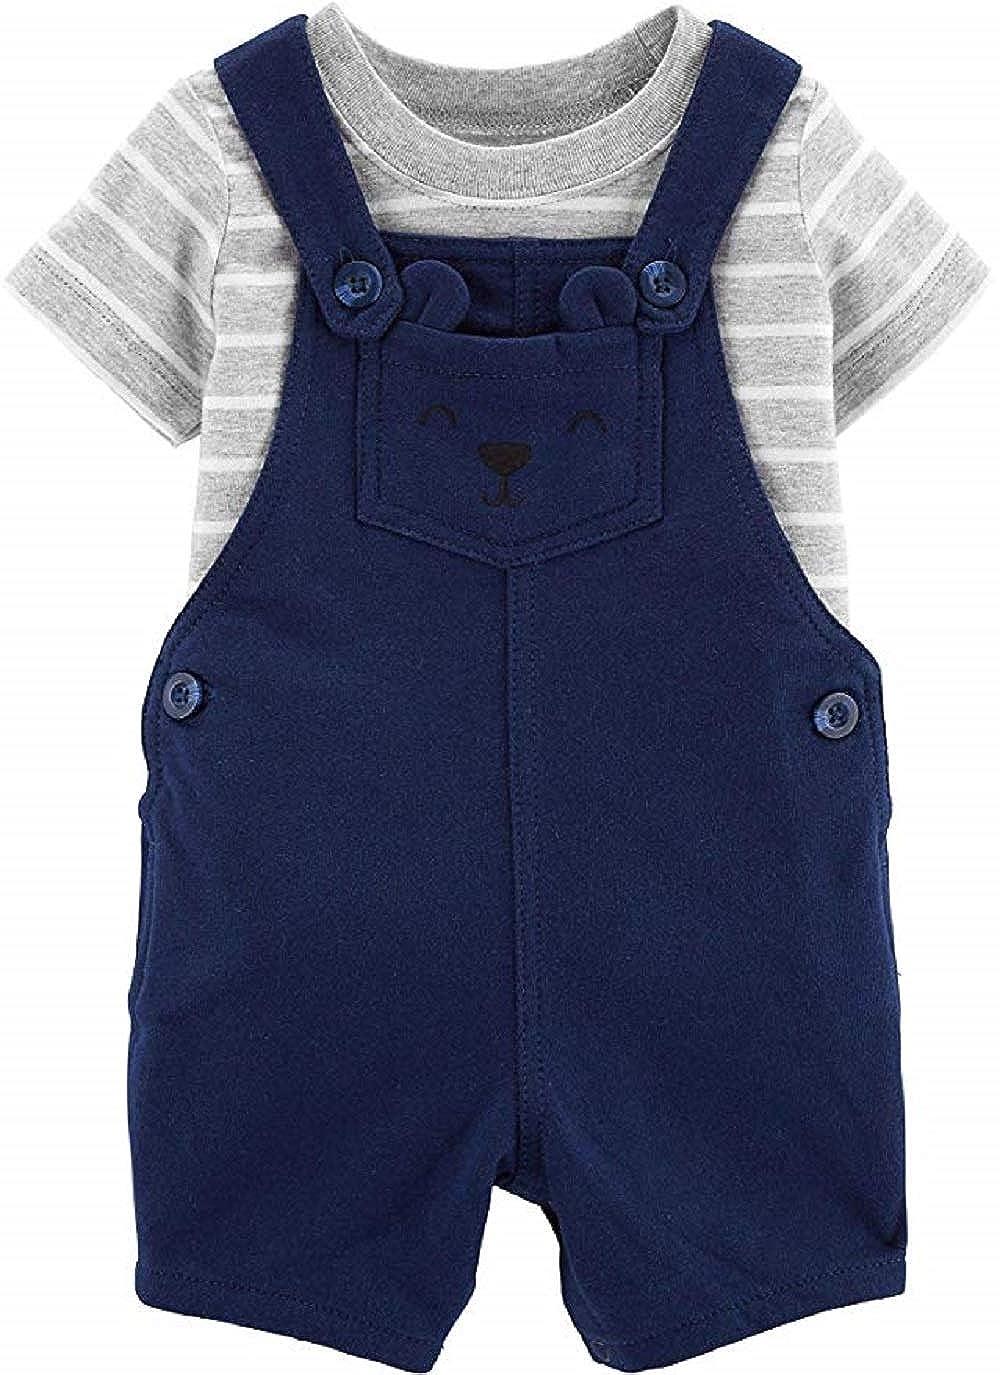 Blue 7 Gray Stripe Carters Baby Boy 2 Piece Overall Short Set